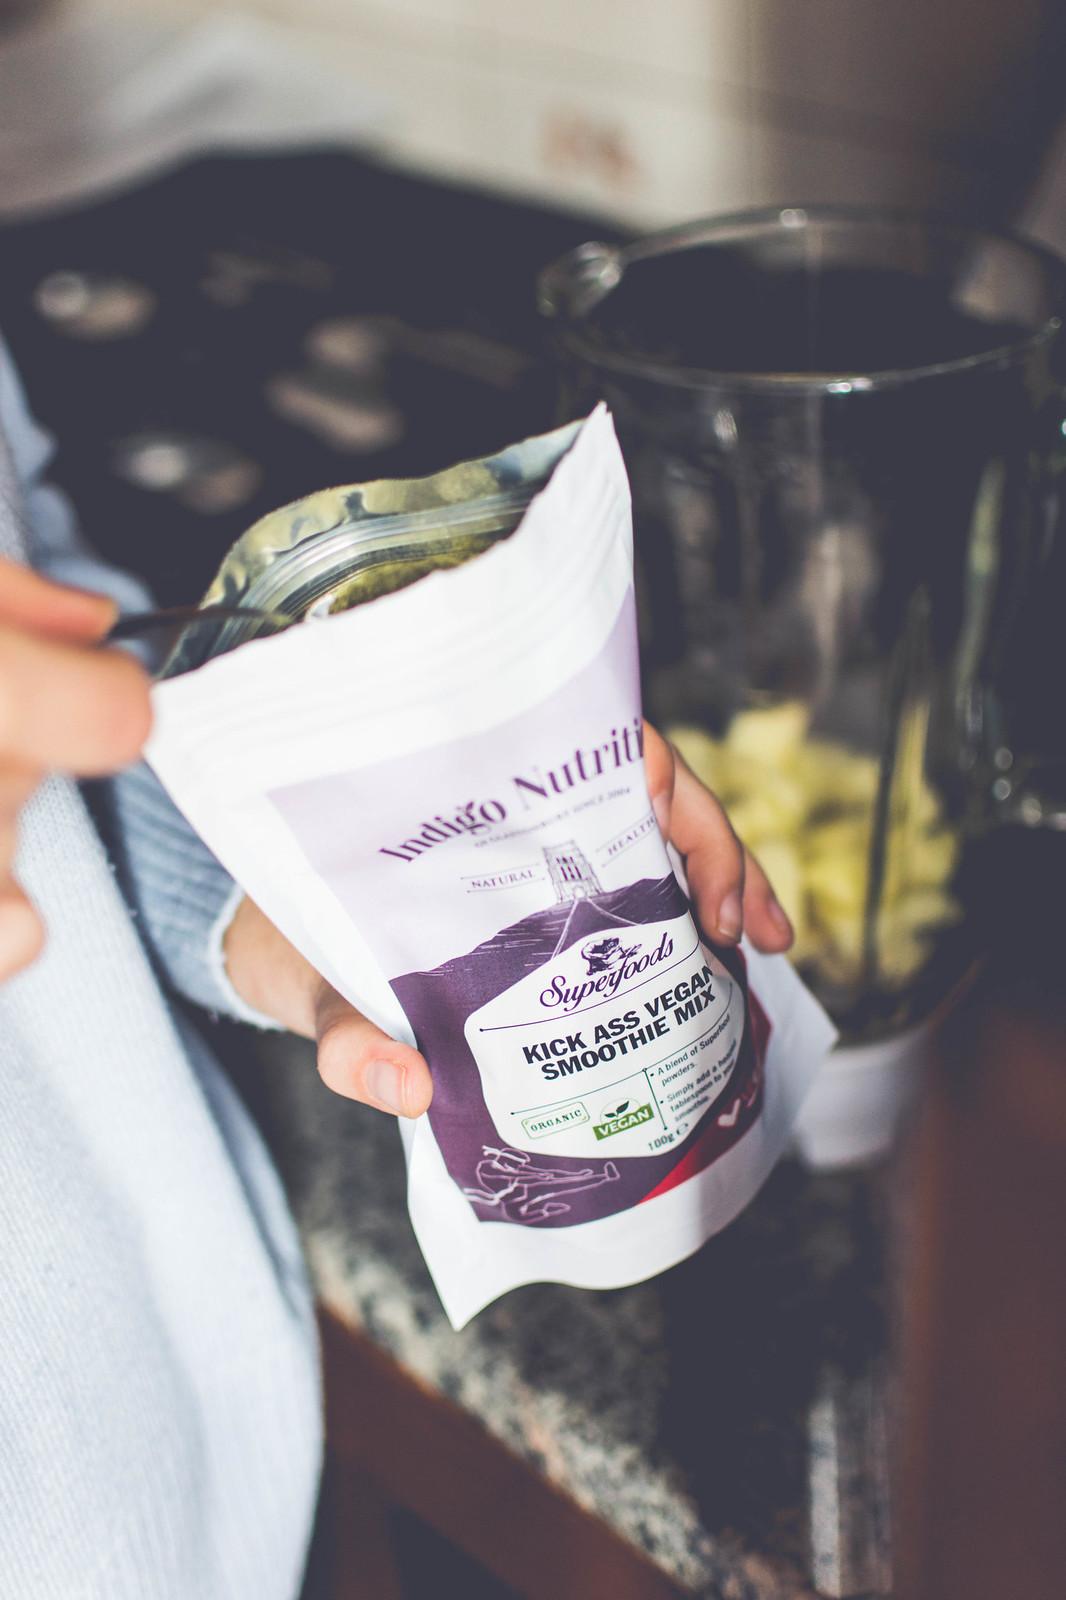 My January detox smoothie with Indigo Herbs Kick Ass Vegan Smoothie Mix